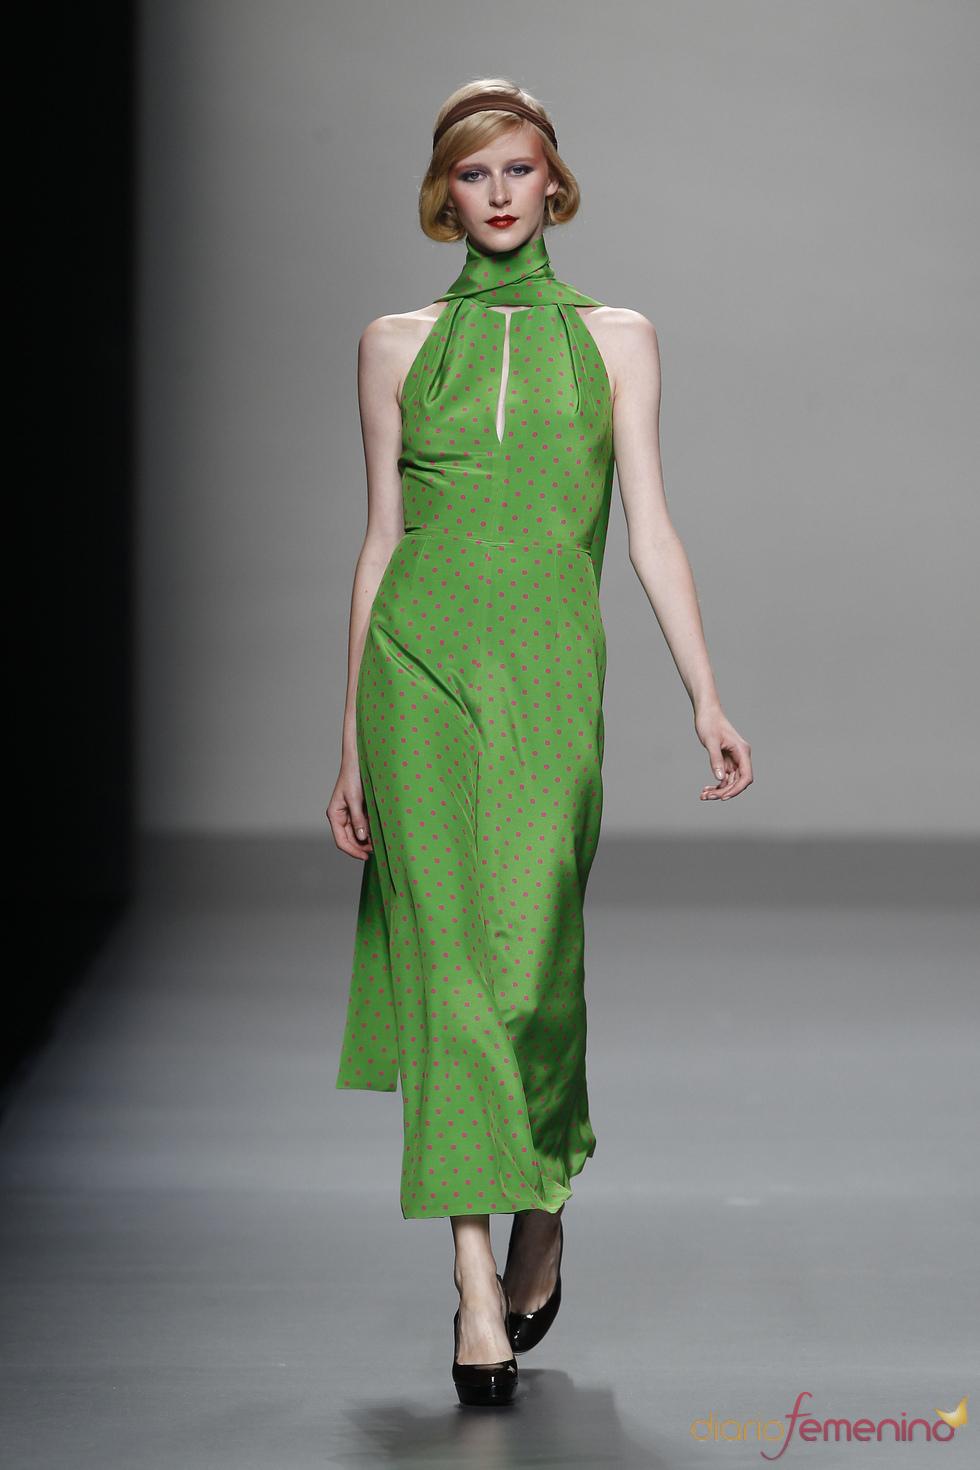 Cibeles Madrid Fashion Week 09-2010: Lemoniez